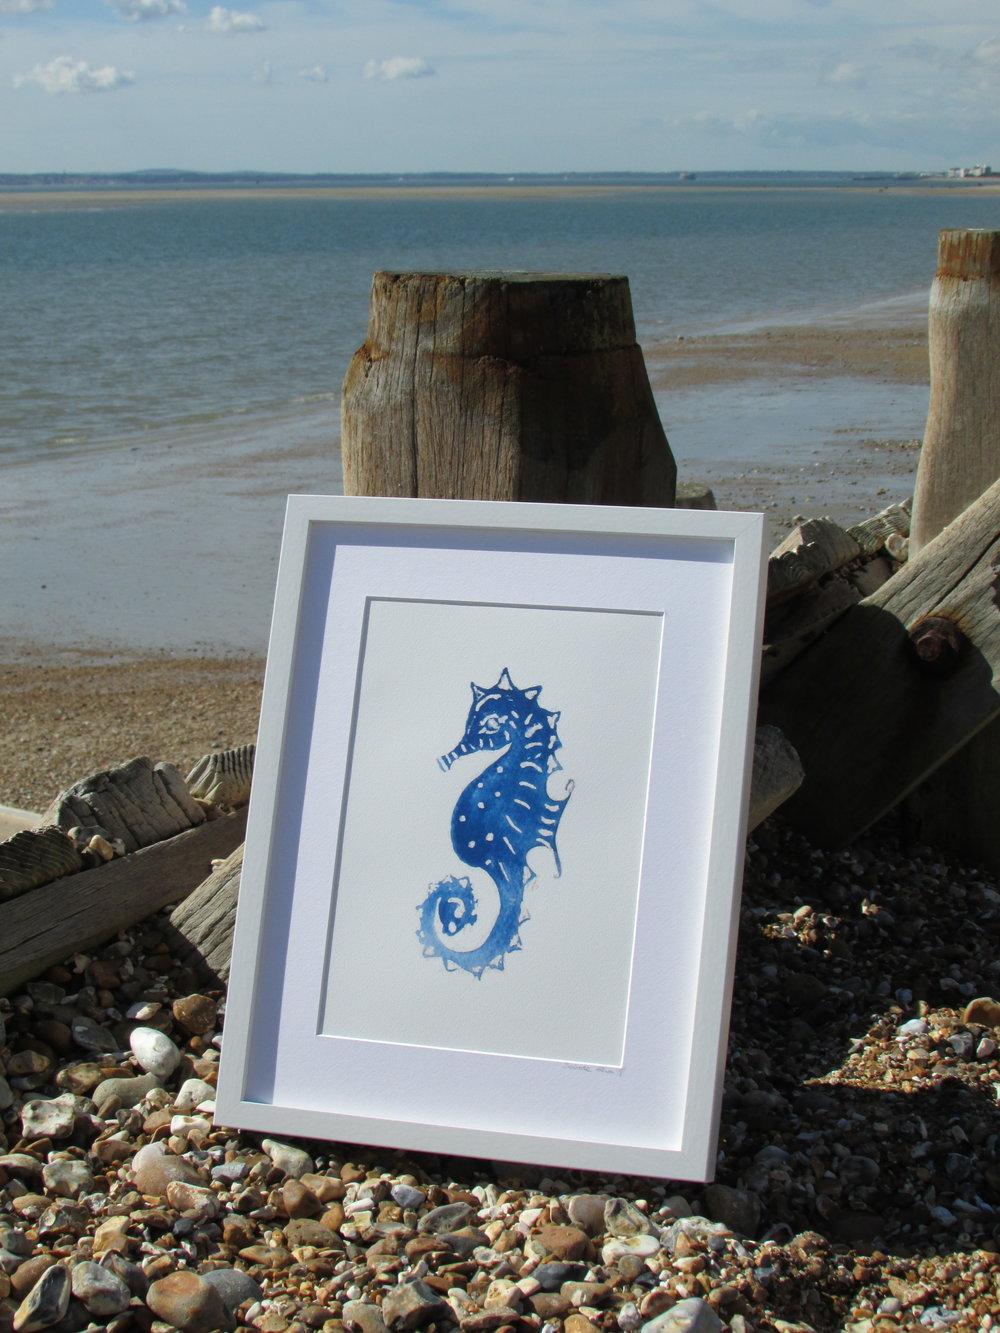 Seahorse on Hayling Island